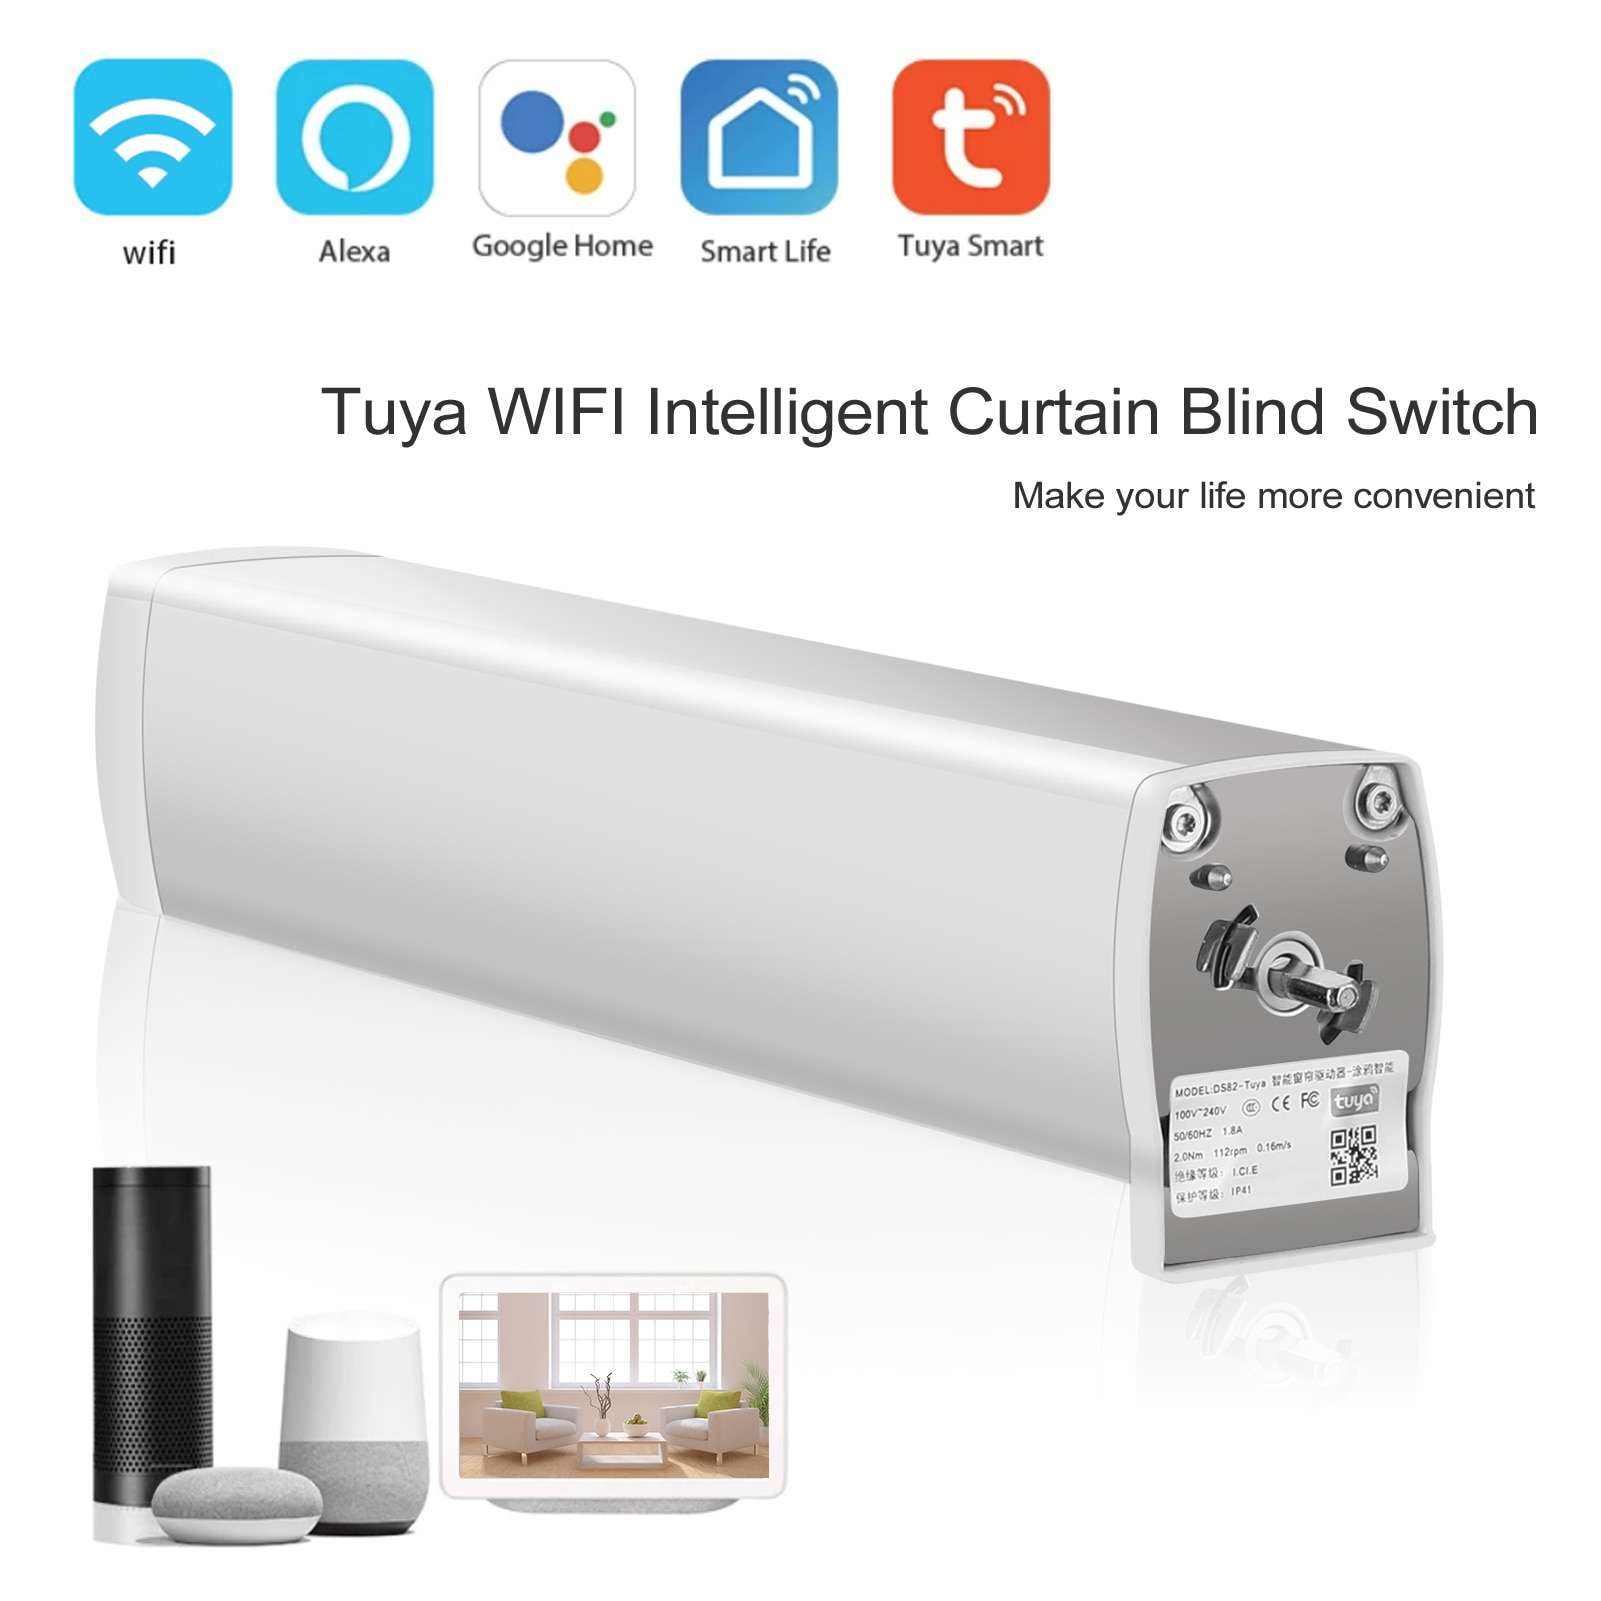 Tuya WIFI ذكي محرك الستائر الترا هادئة الكهربائية اللاسلكية التحكم عن بعد أدوات التحكم الصوتي ل أليكسا جوجل المنزل